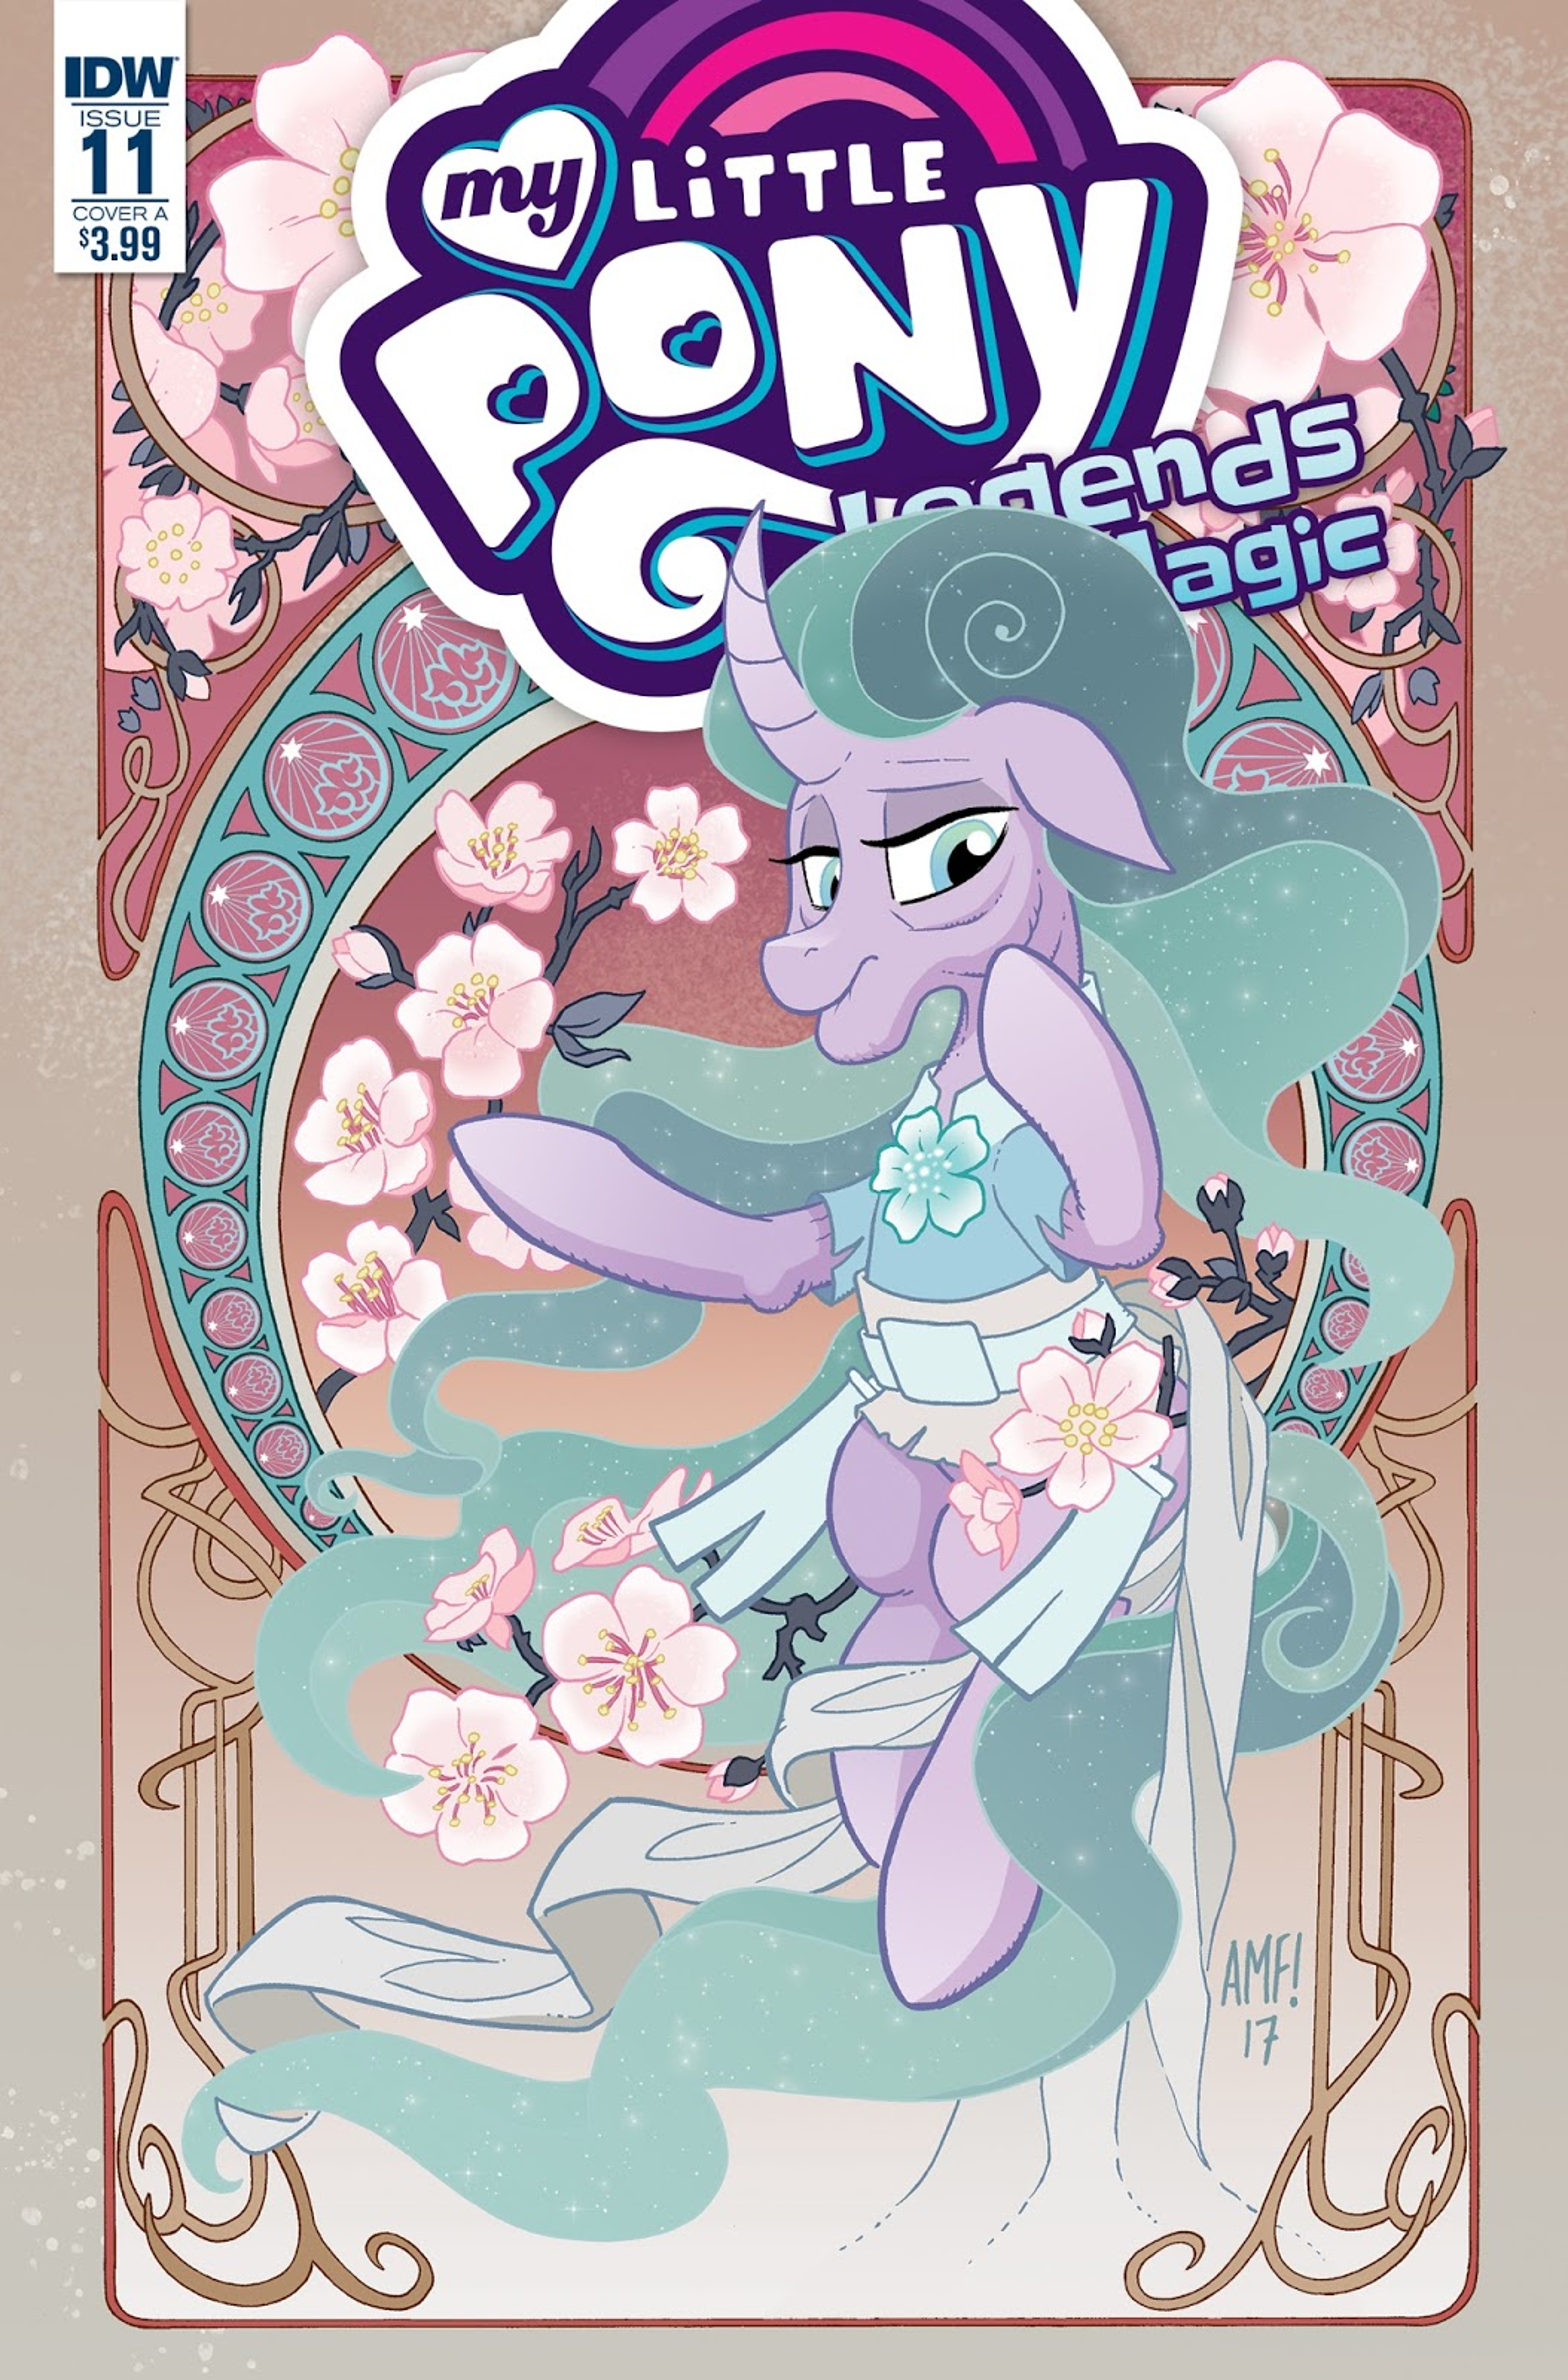 Legends of Magic Issue 11